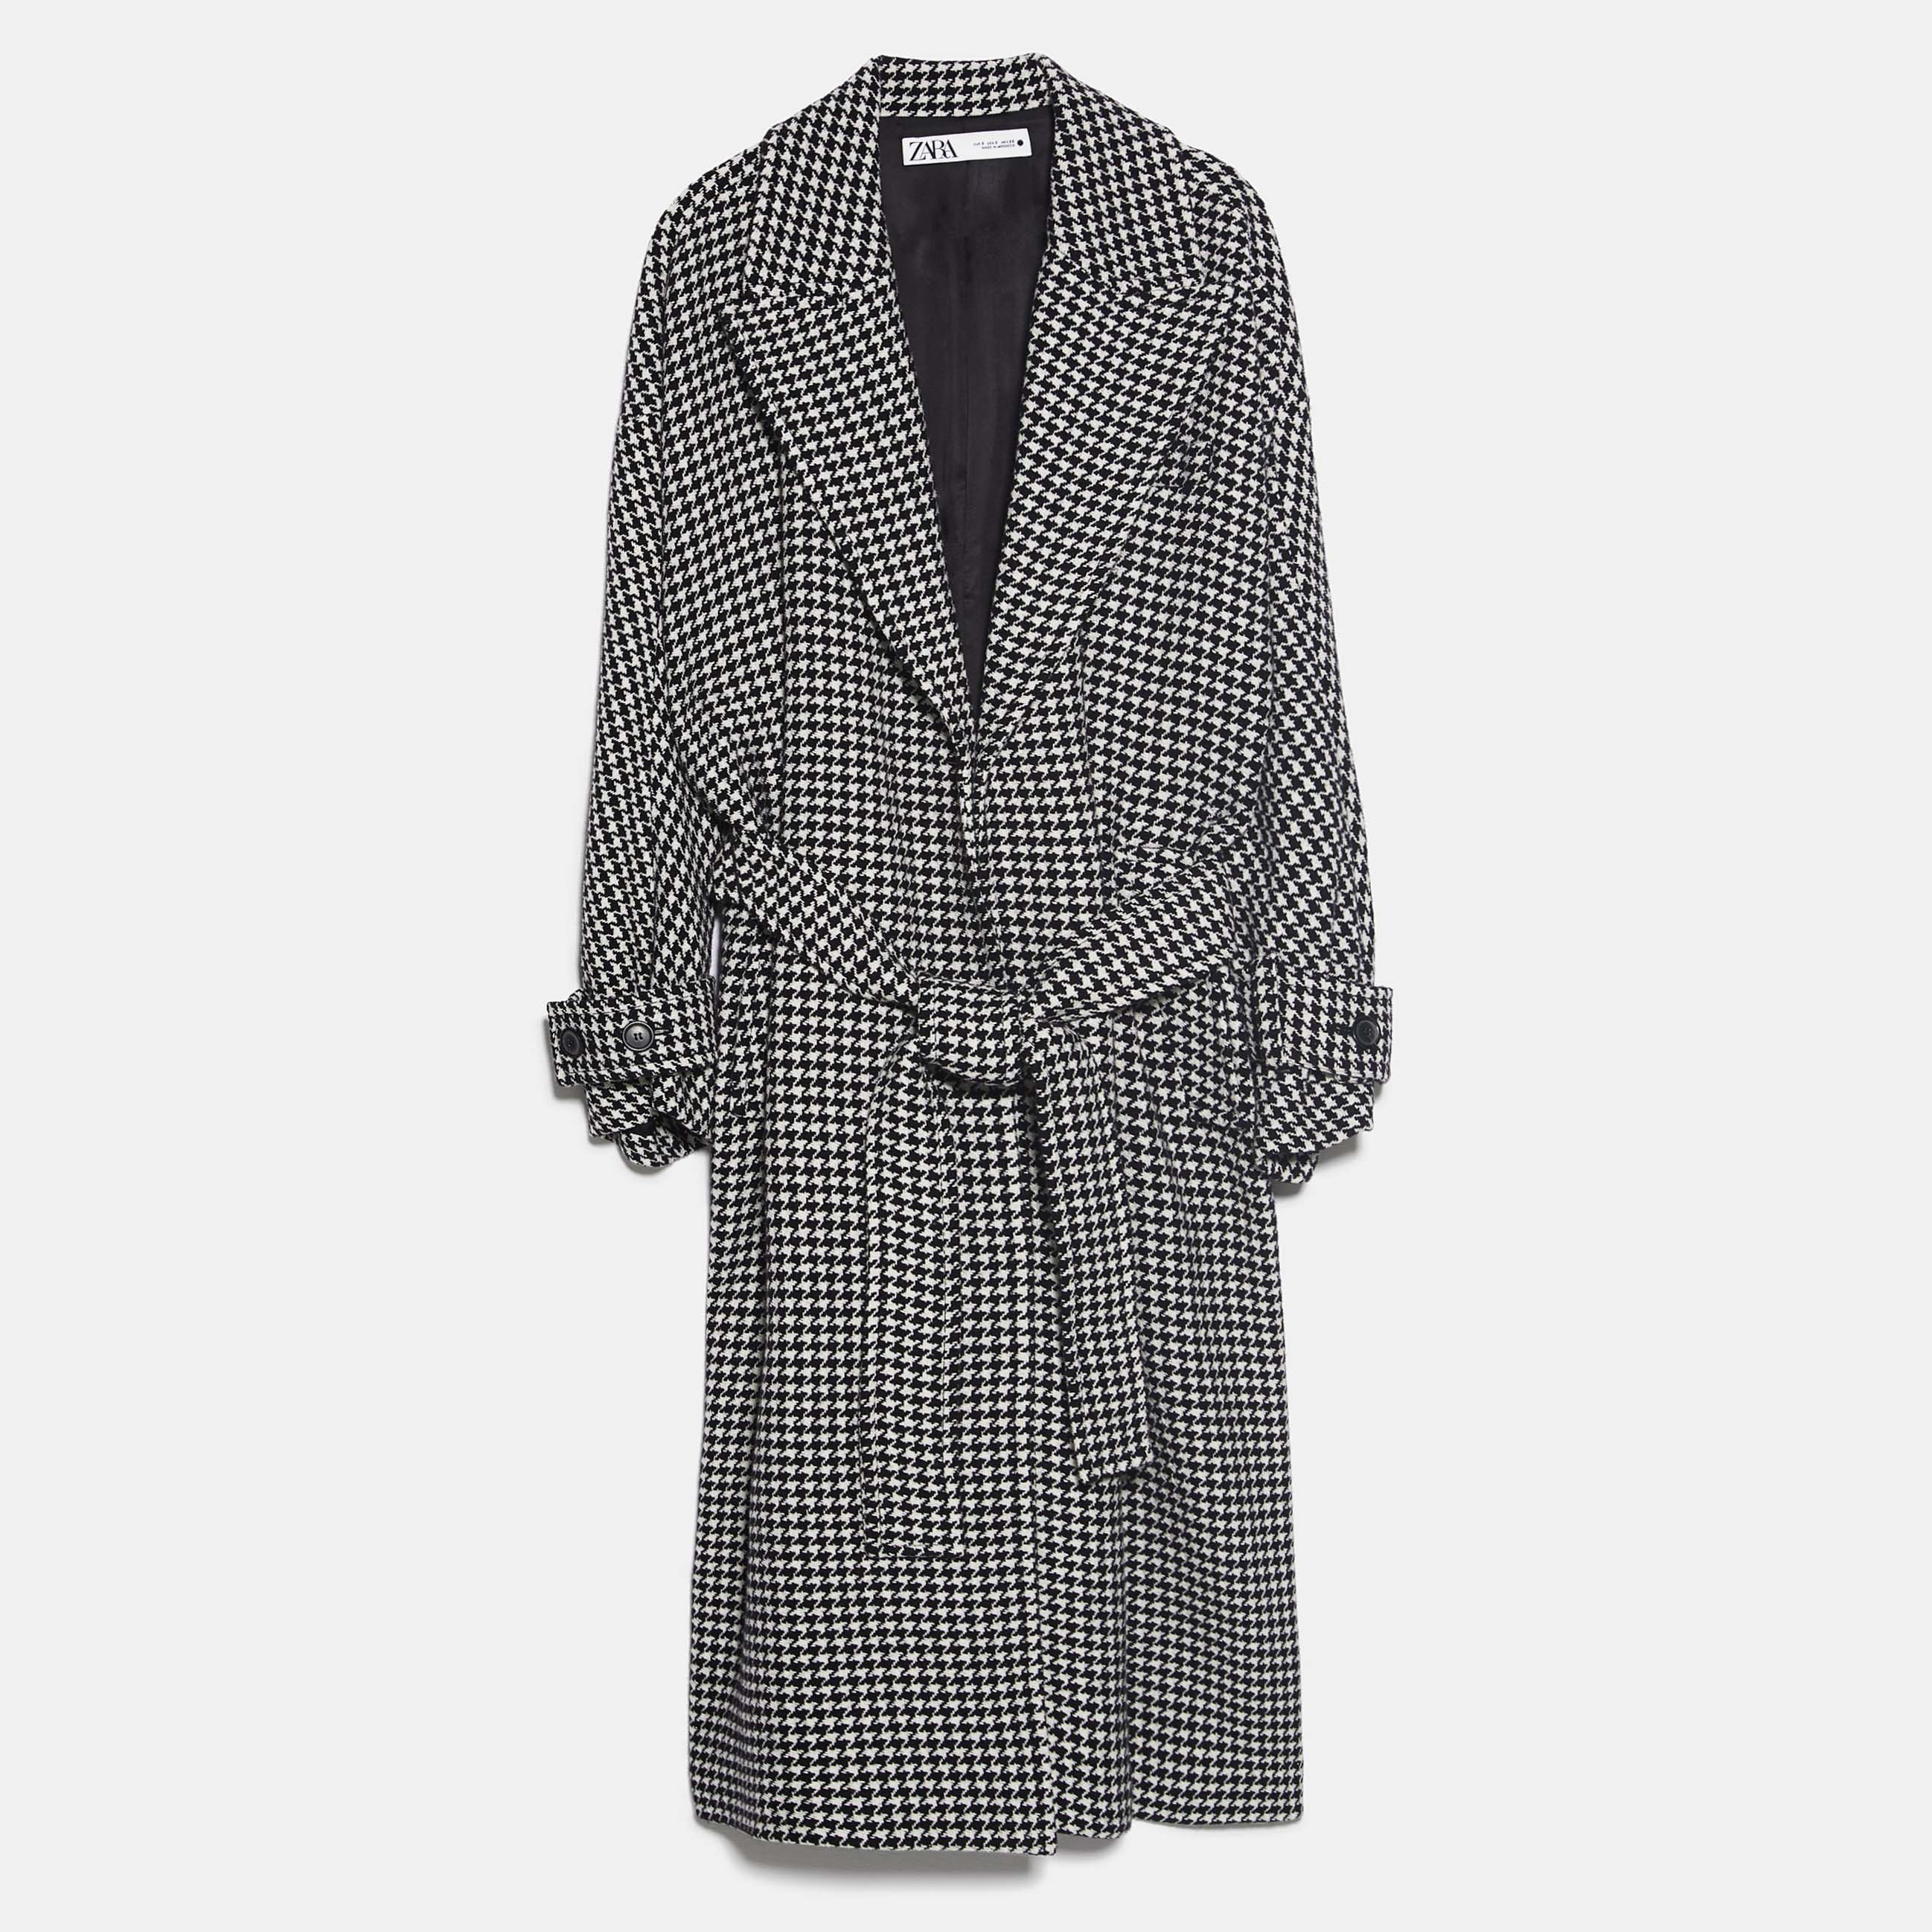 Zara-houndstoothcoat